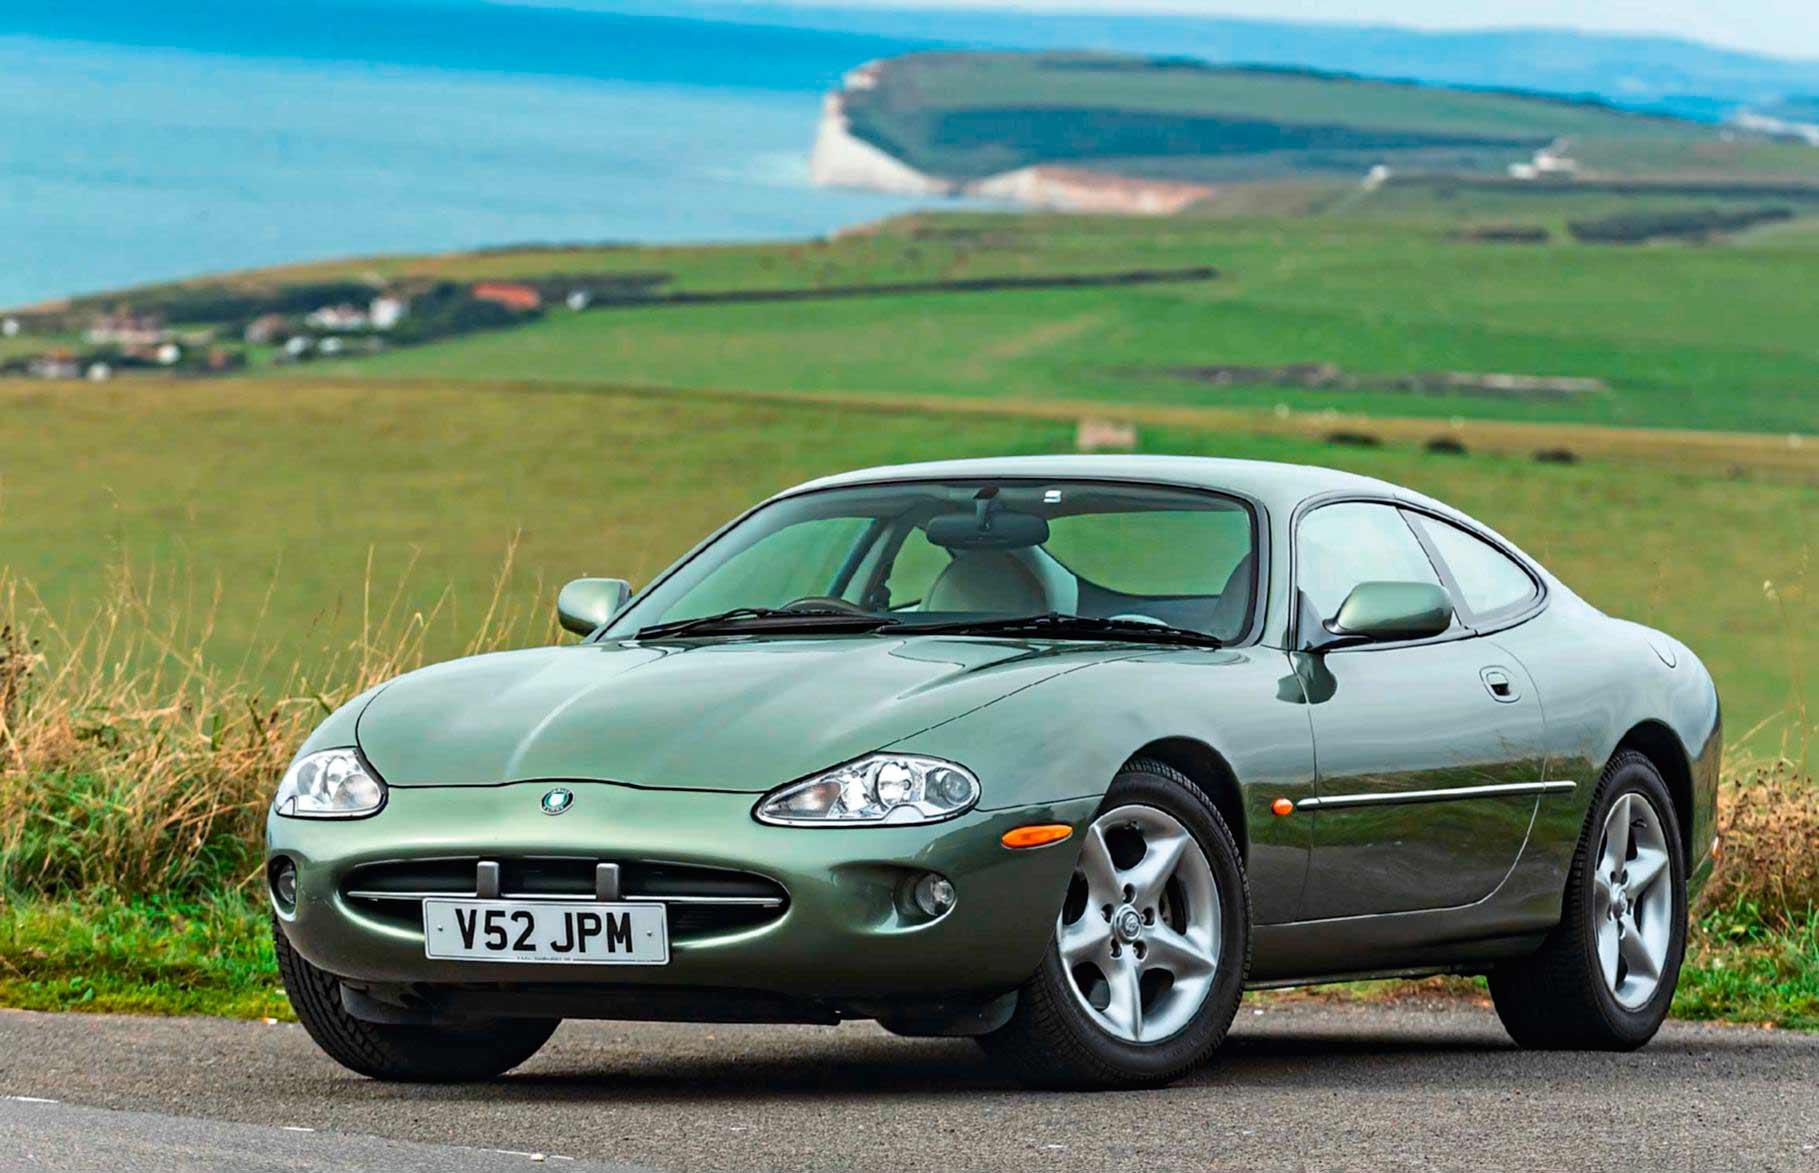 Restored 1998 Jaguar XK8 4 0 X100 - Drive-My Blogs - Drive